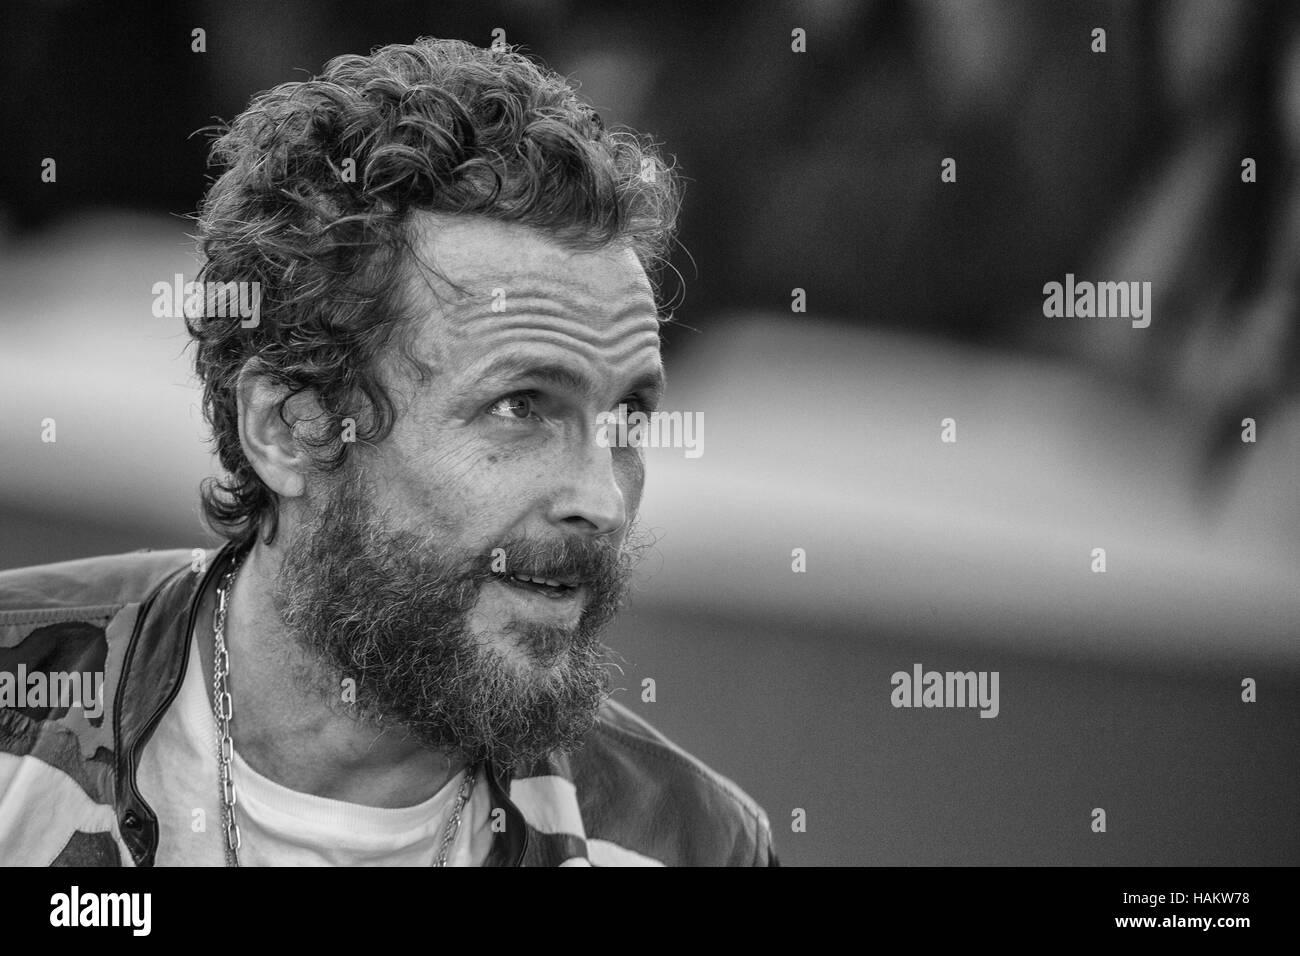 Rom Italien (It) - 16. Oktober 2016 - Rugby - Auditorium Parco della Musica in Rom - Lorenzo Cherubini, ist ein Stockbild